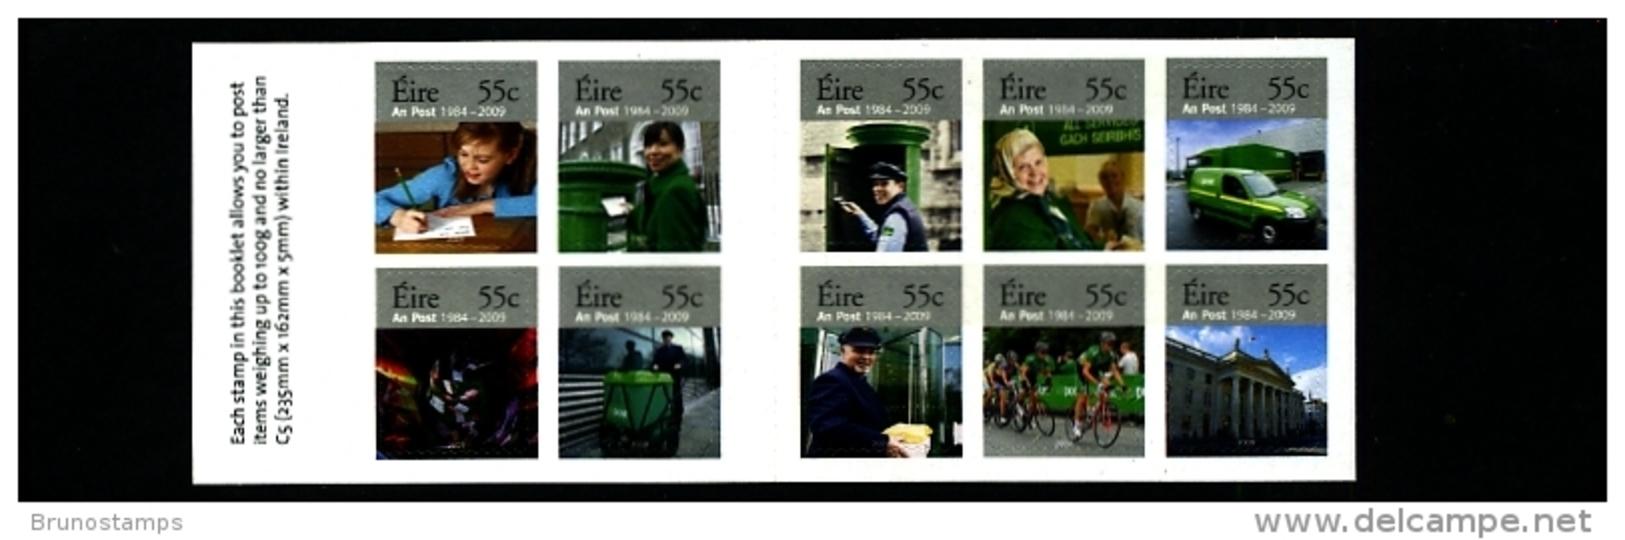 IRELAND/EIRE - 2009  AN POST ANNIVERSARY  SET  EX  BOOKLET  MINT NH - Nuovi